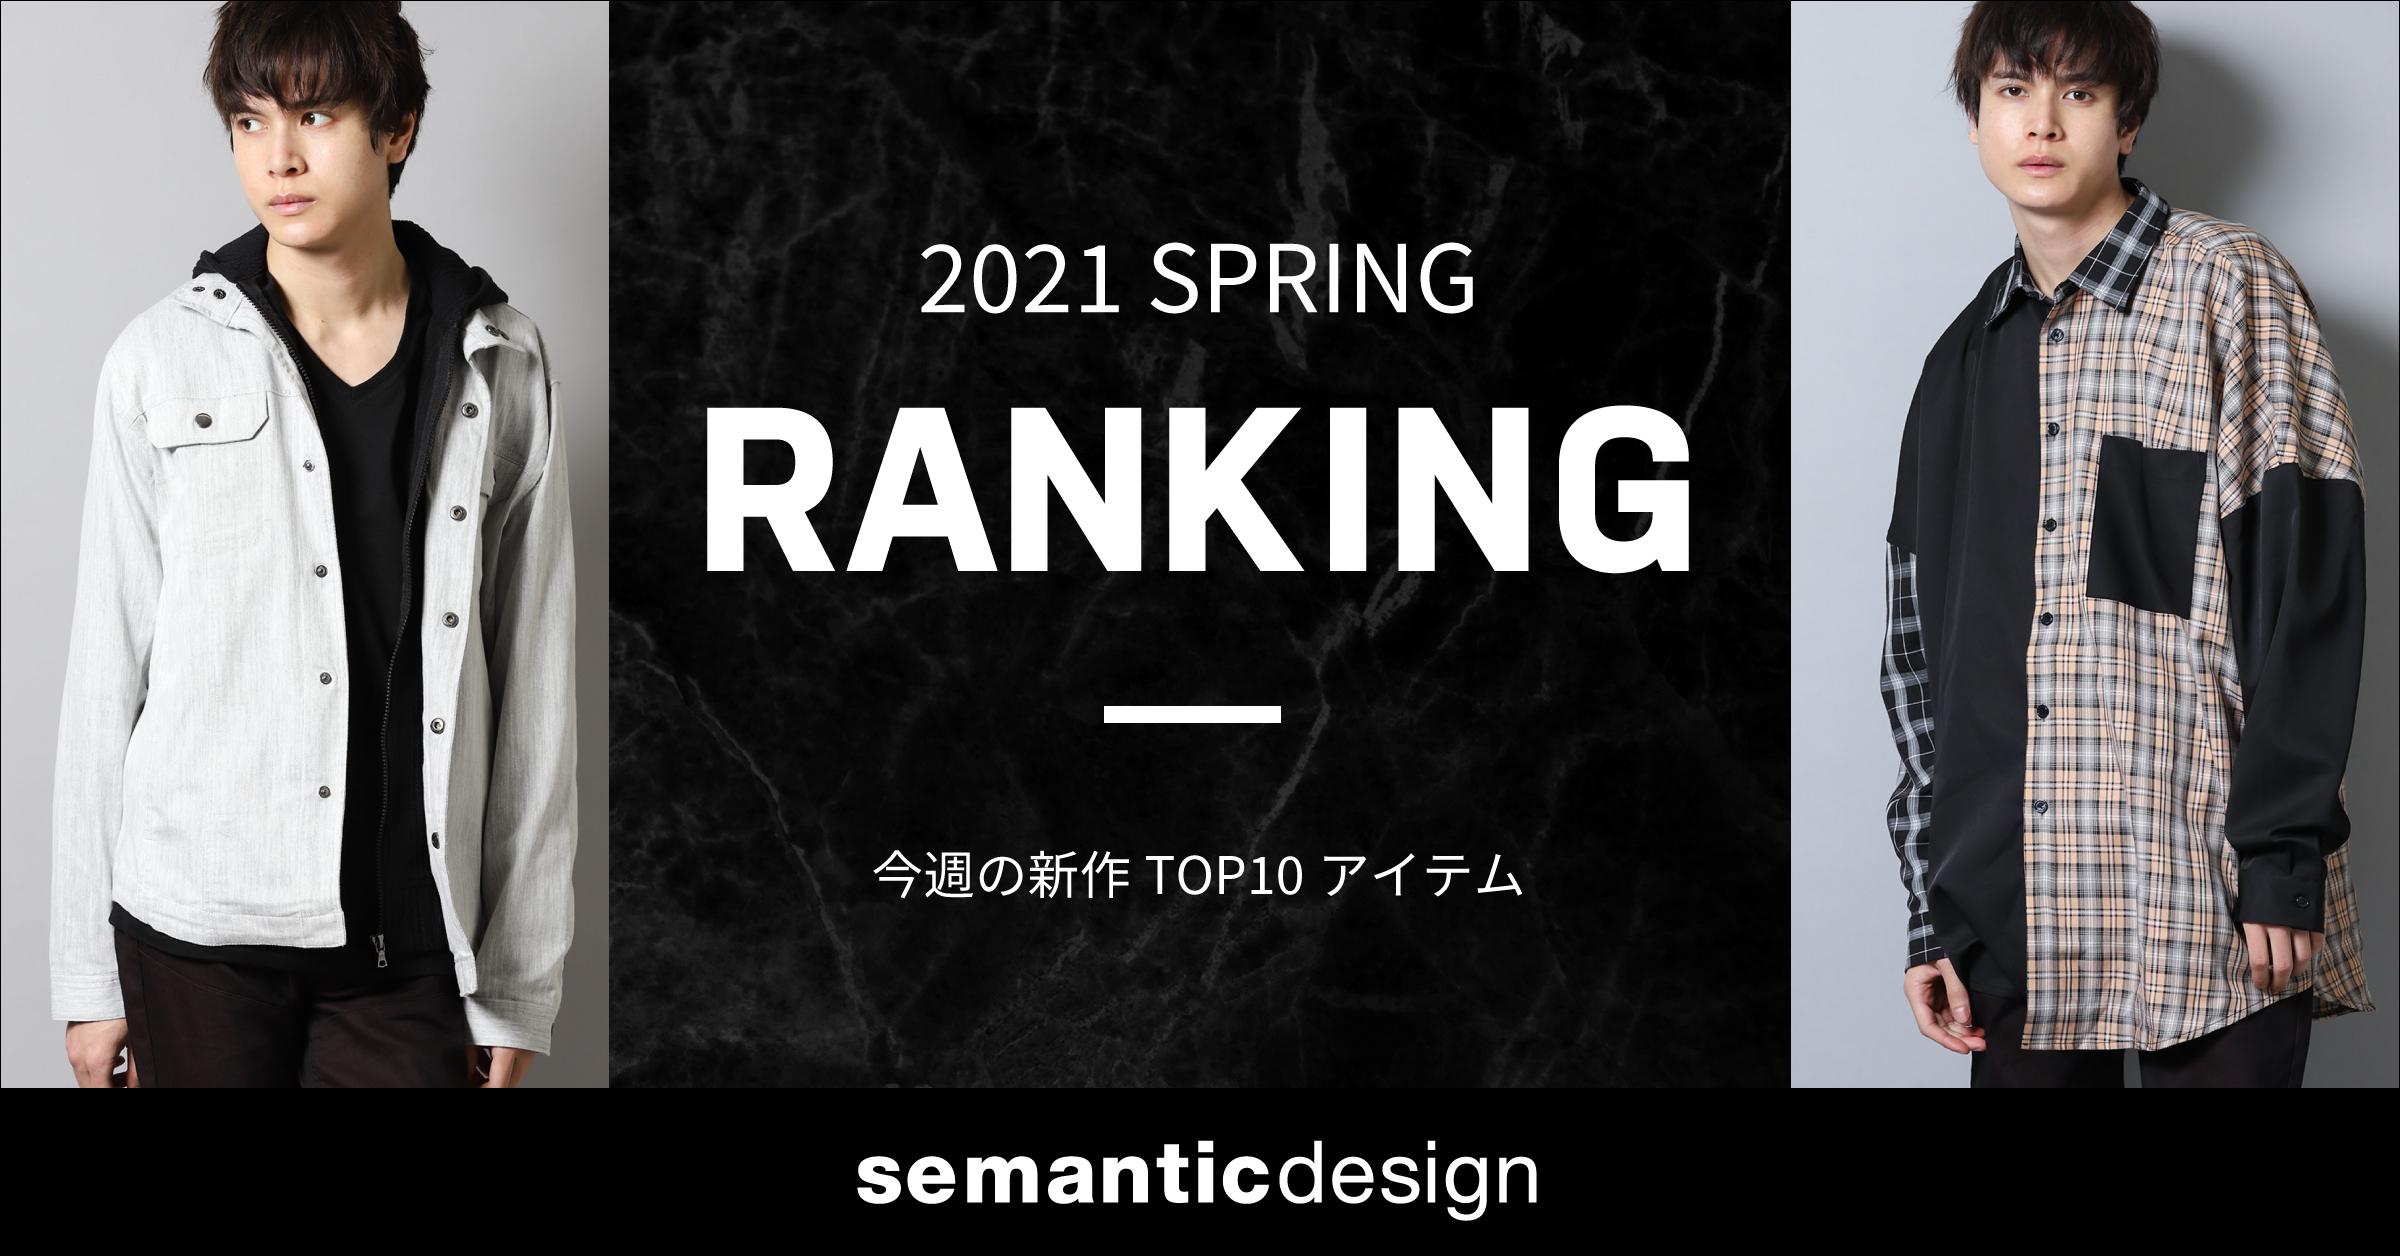 semanticdesign 今週の新作人気ランキング